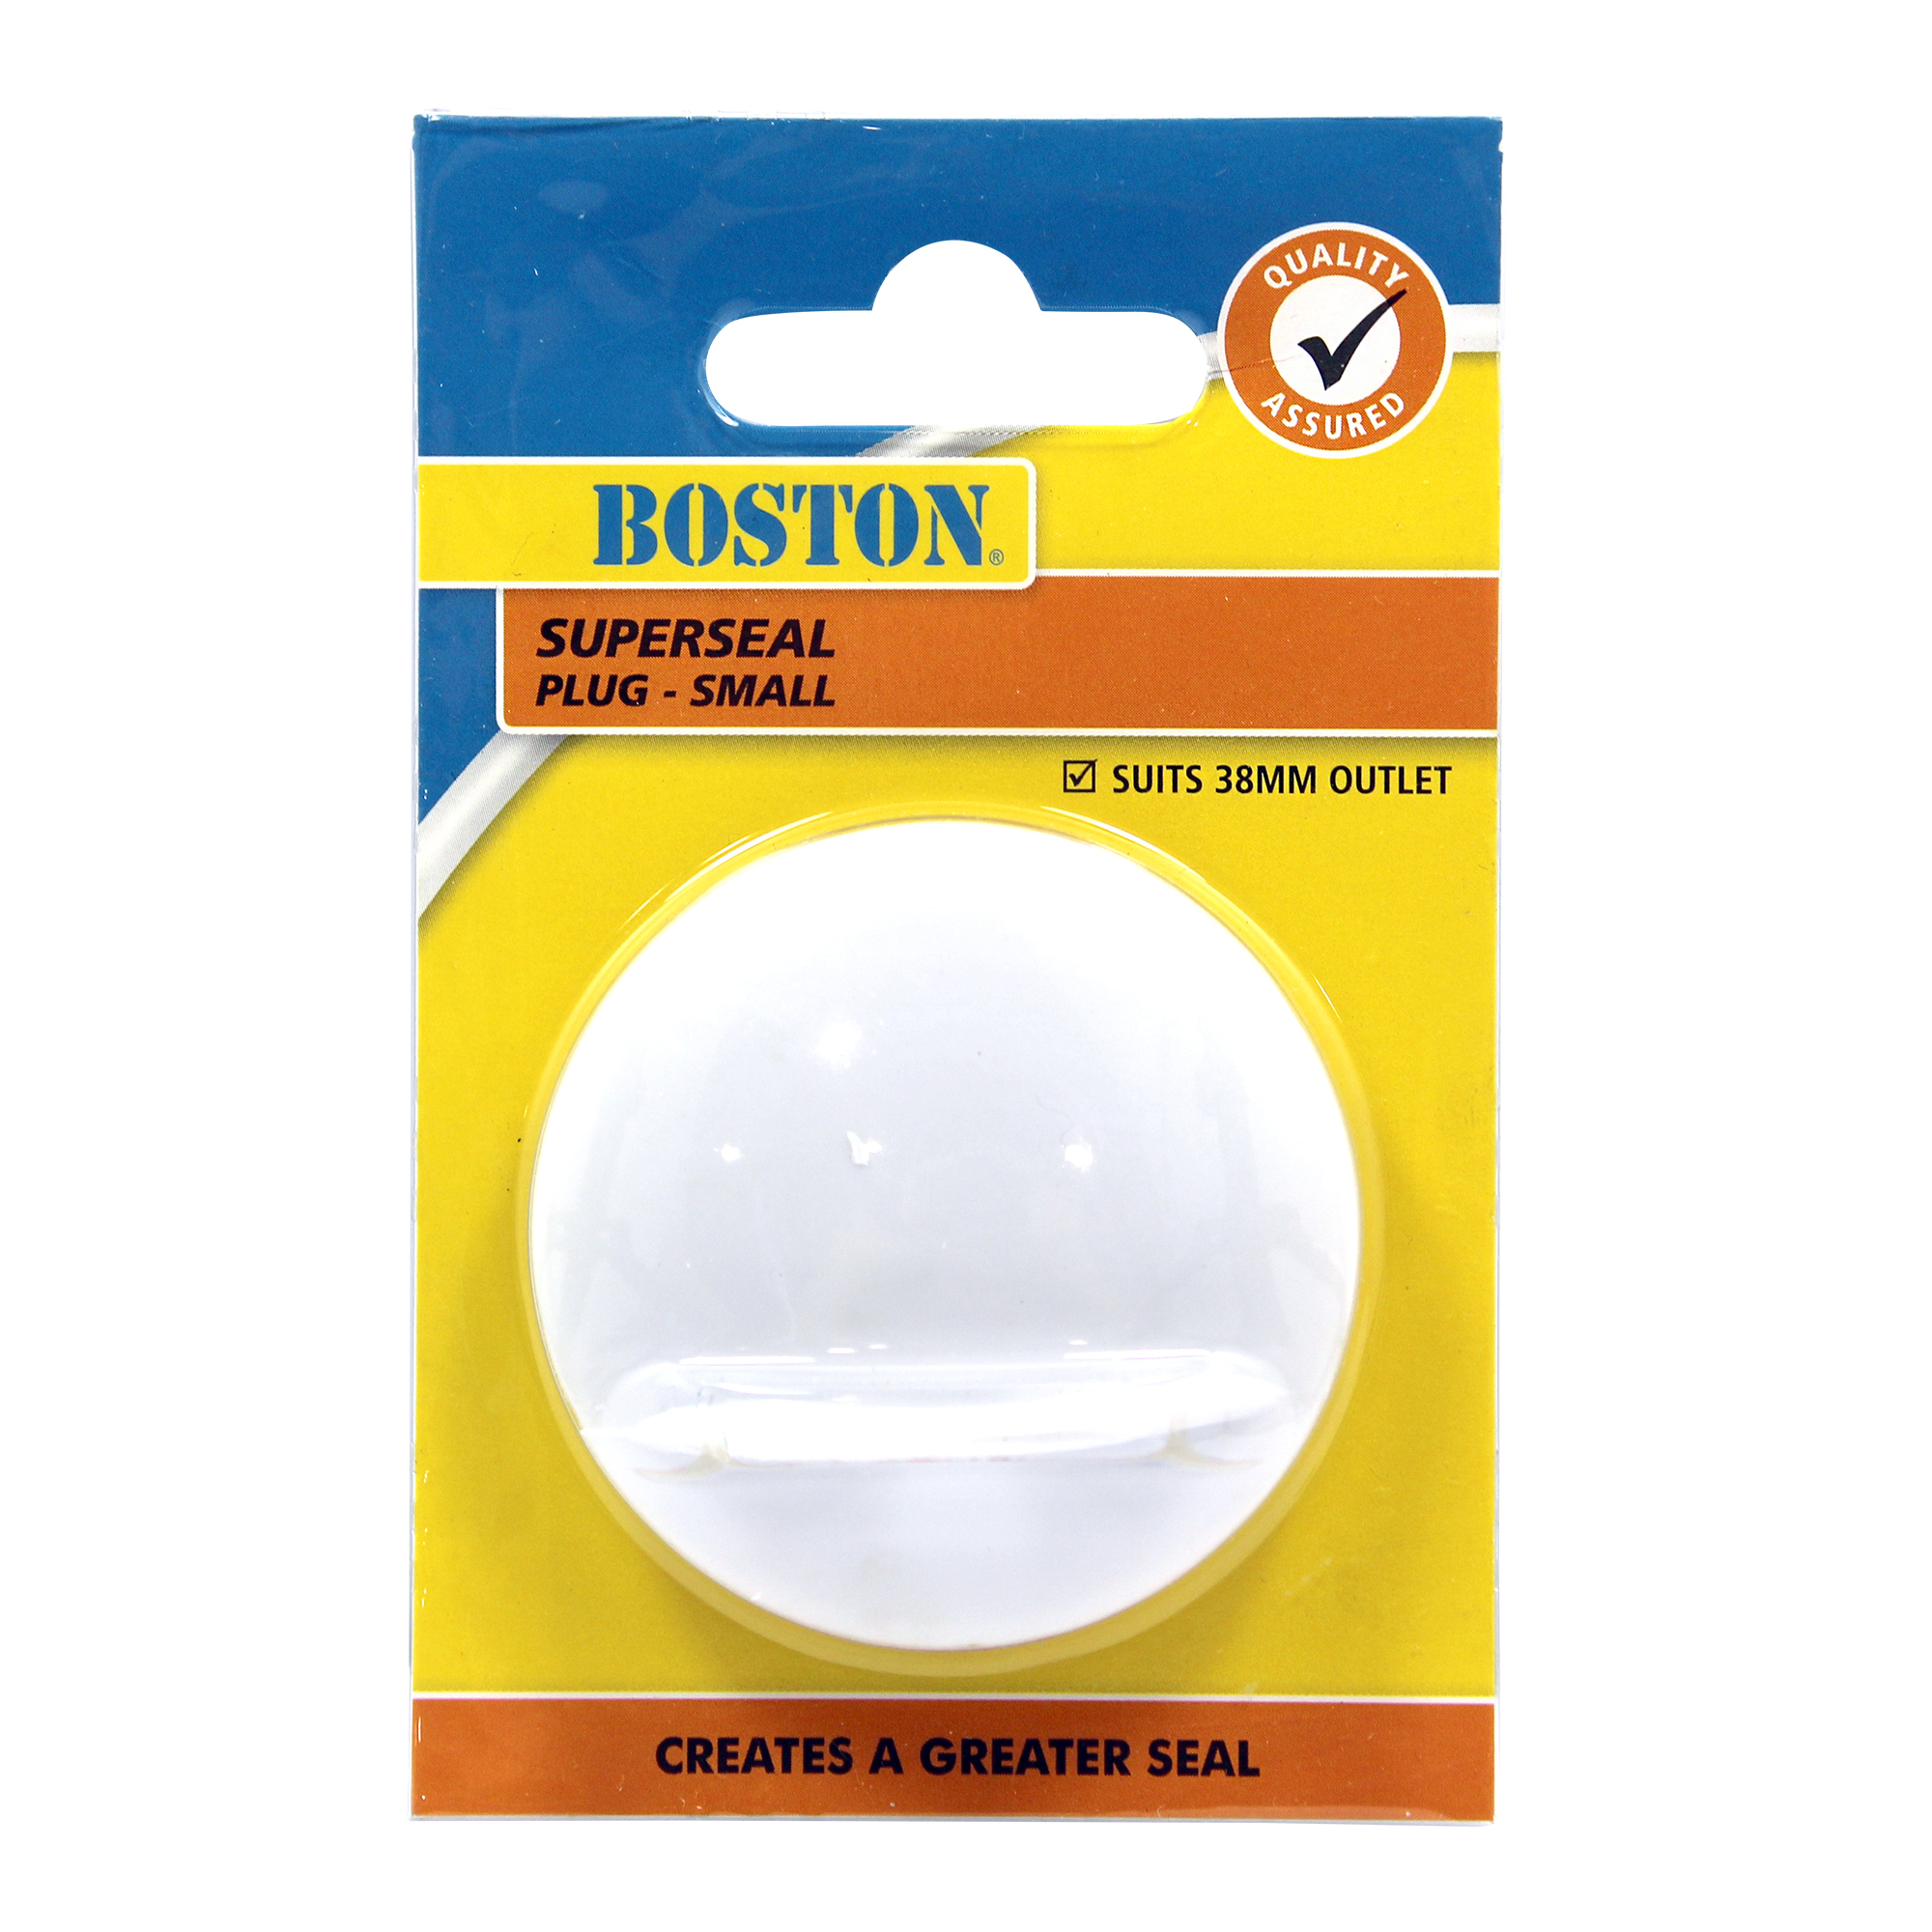 Superseal Plugs Boston